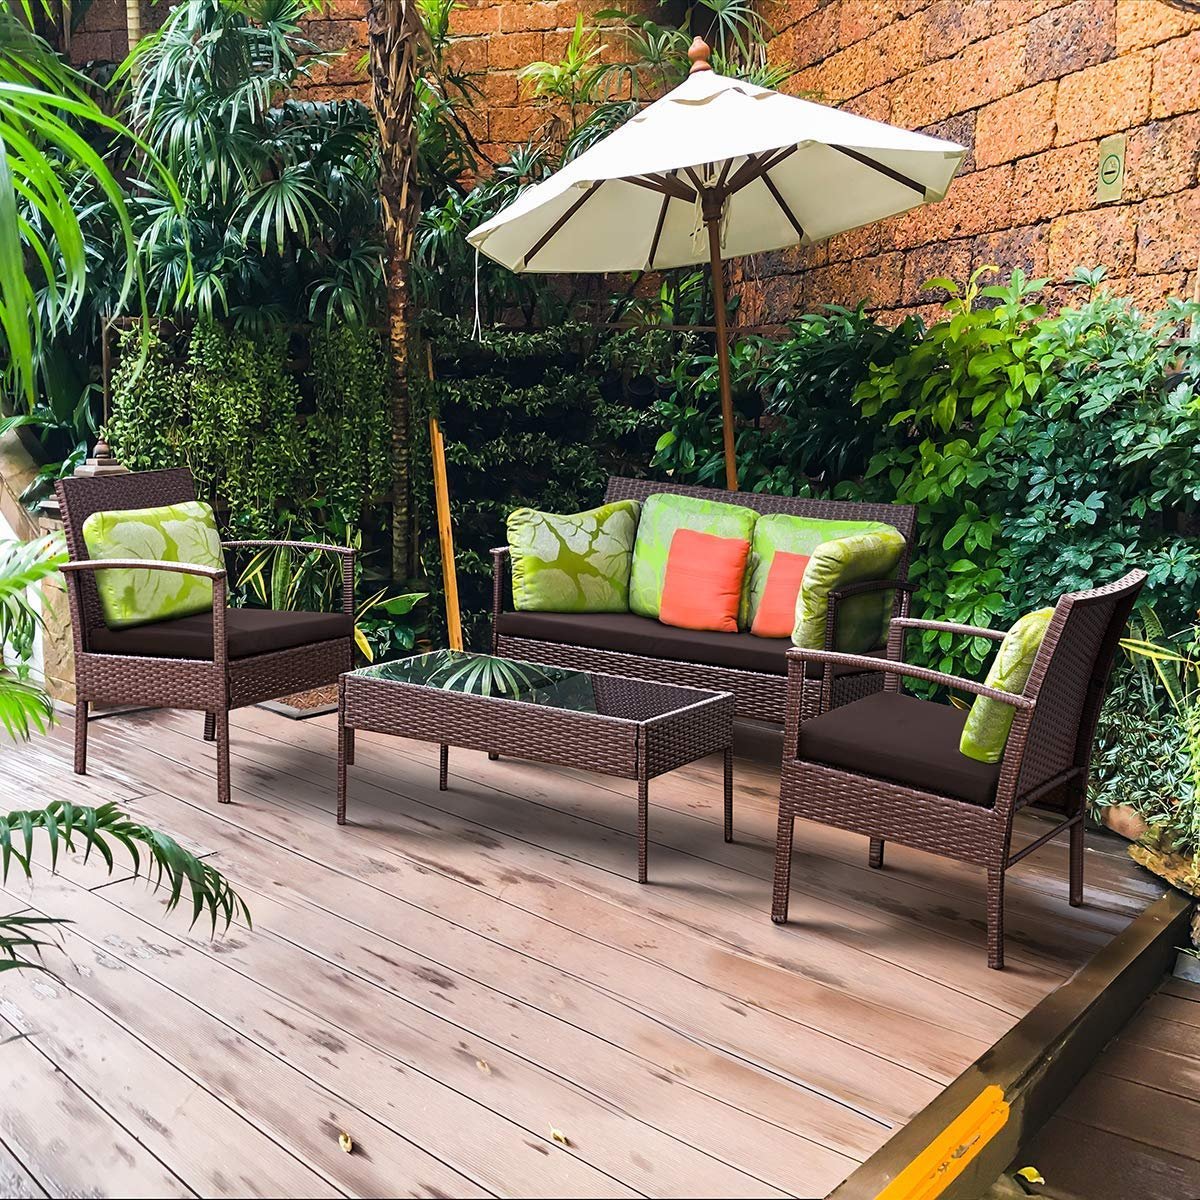 Tangkula 4 piece outdoor furniture set patio garden pool lawn rattan wicker loveseat sofa cushioned seat glass top coffee table modern wicker rattan